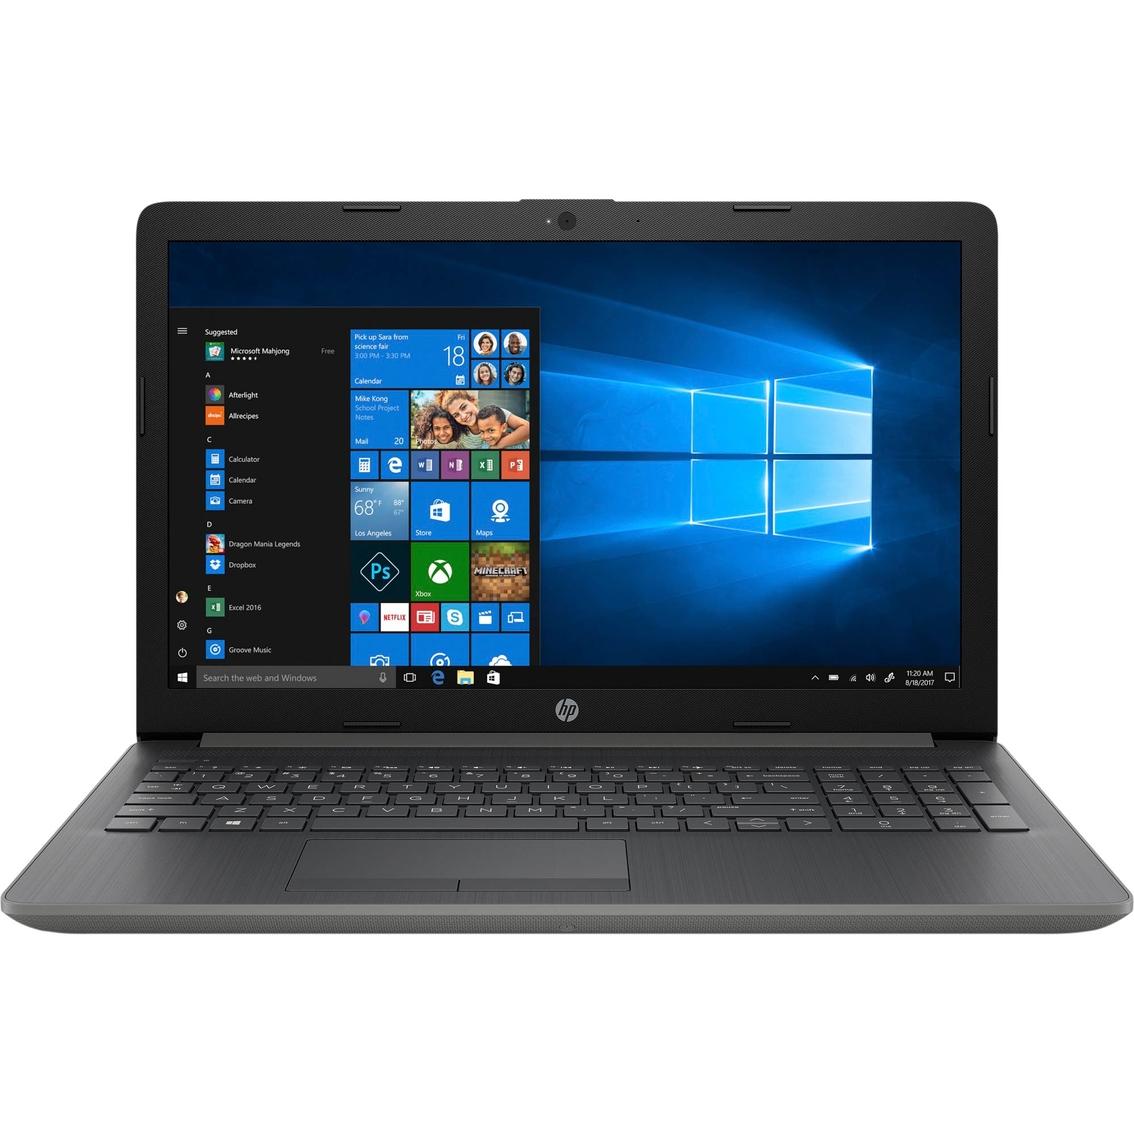 Hp 15 6 In Amd Ryzen 5 2500u 2ghz Amd Radeon Vega 8 8gb Ram 1tb Hdd Notebook Laptops Home Office School Shop The Exchange